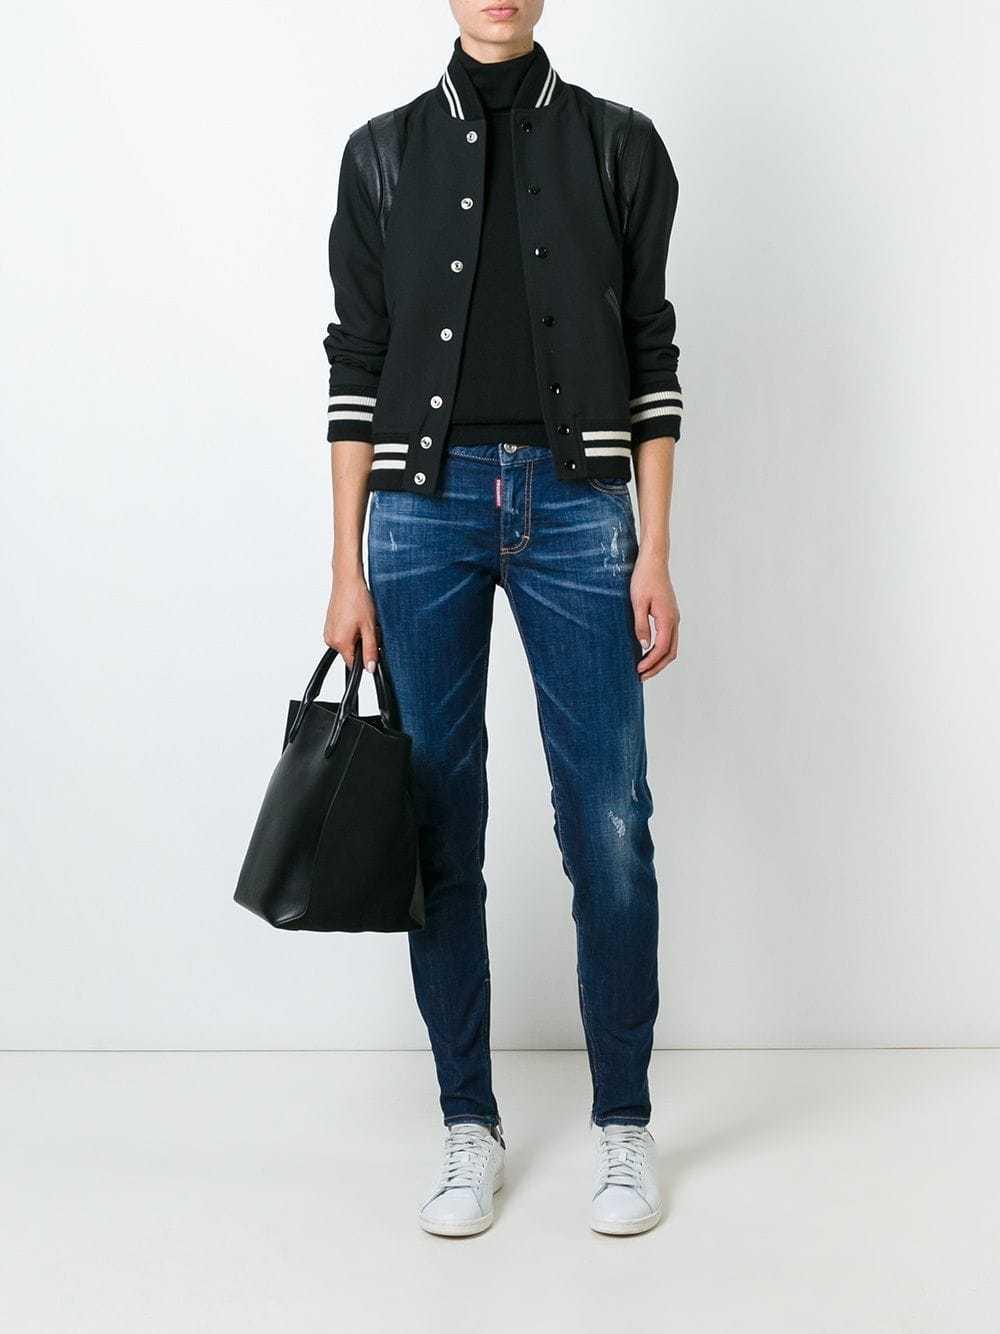 DSQUARED2 Medium Waist Dark bluee Wash Distressed Denim Cotton Skinny Jeans 44 8